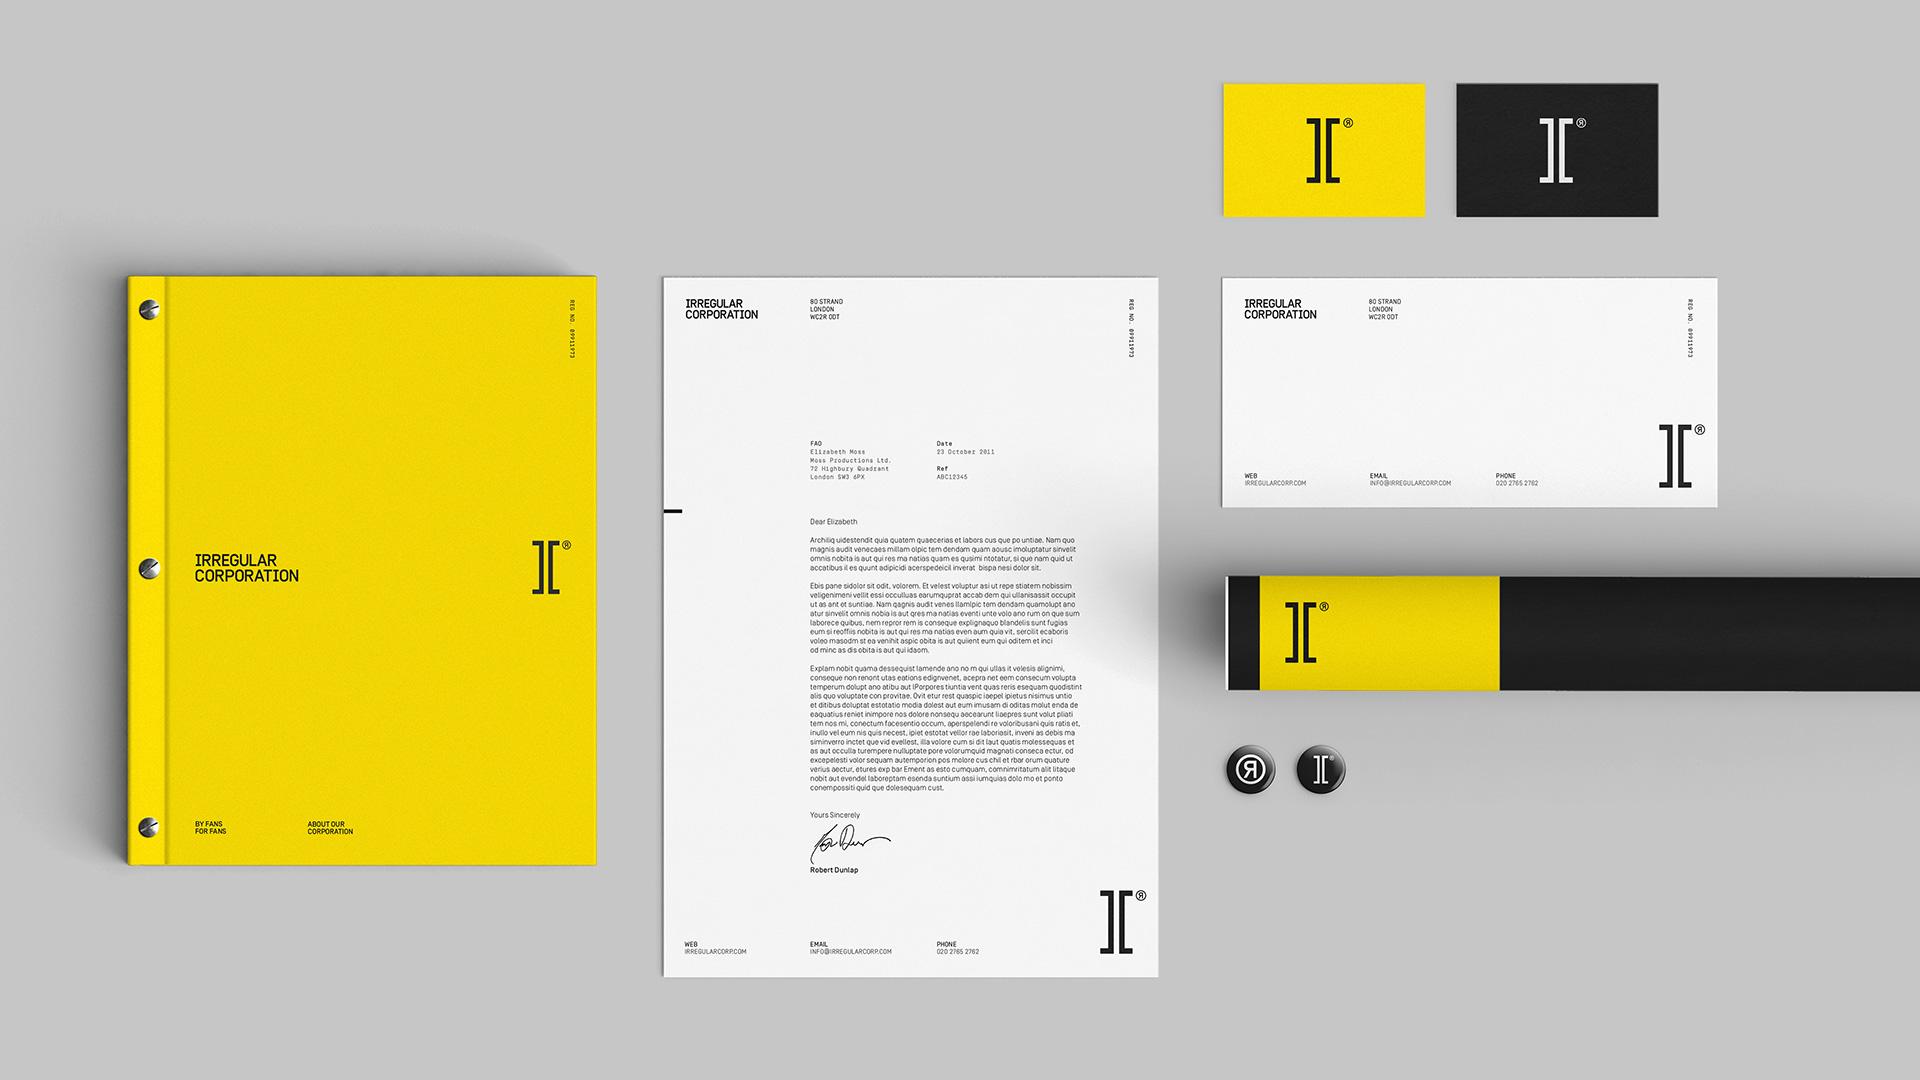 Irregular_Corporation_brand_identity4a